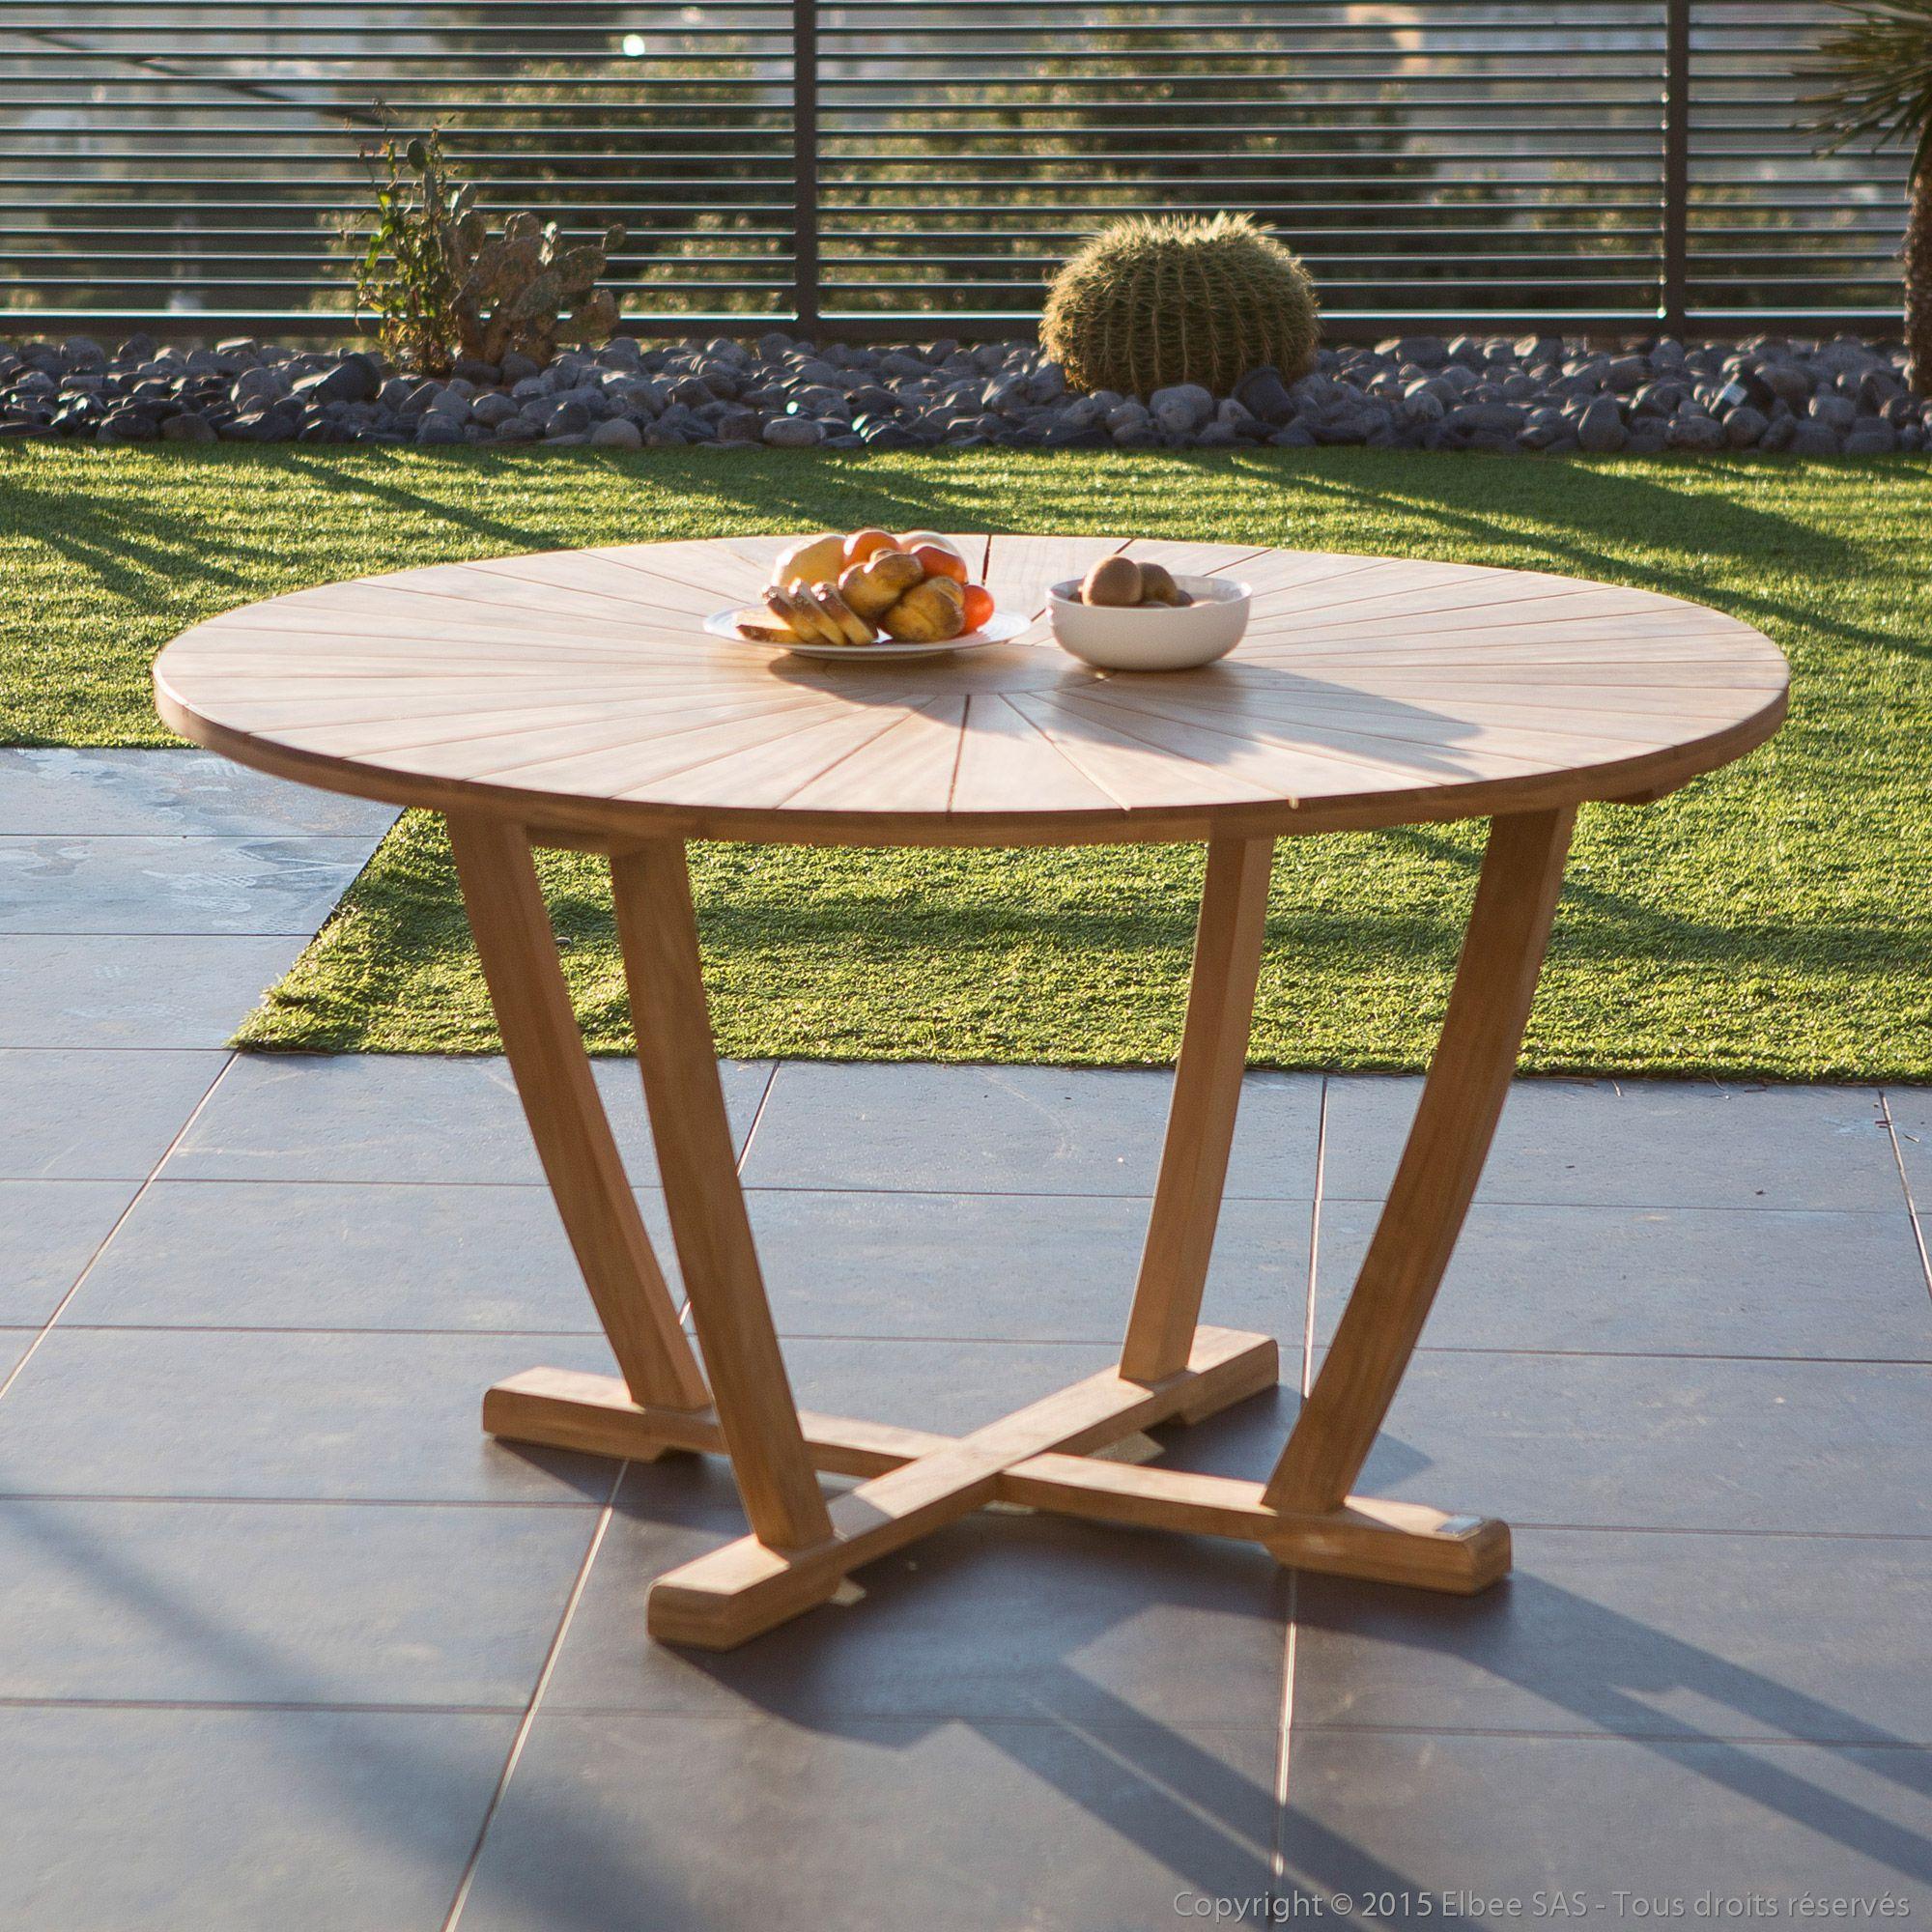 Table De Jardin Ronde En Teck Brut 140Cm Palma Ermanno G ... destiné Table De Jardin Ronde En Bois